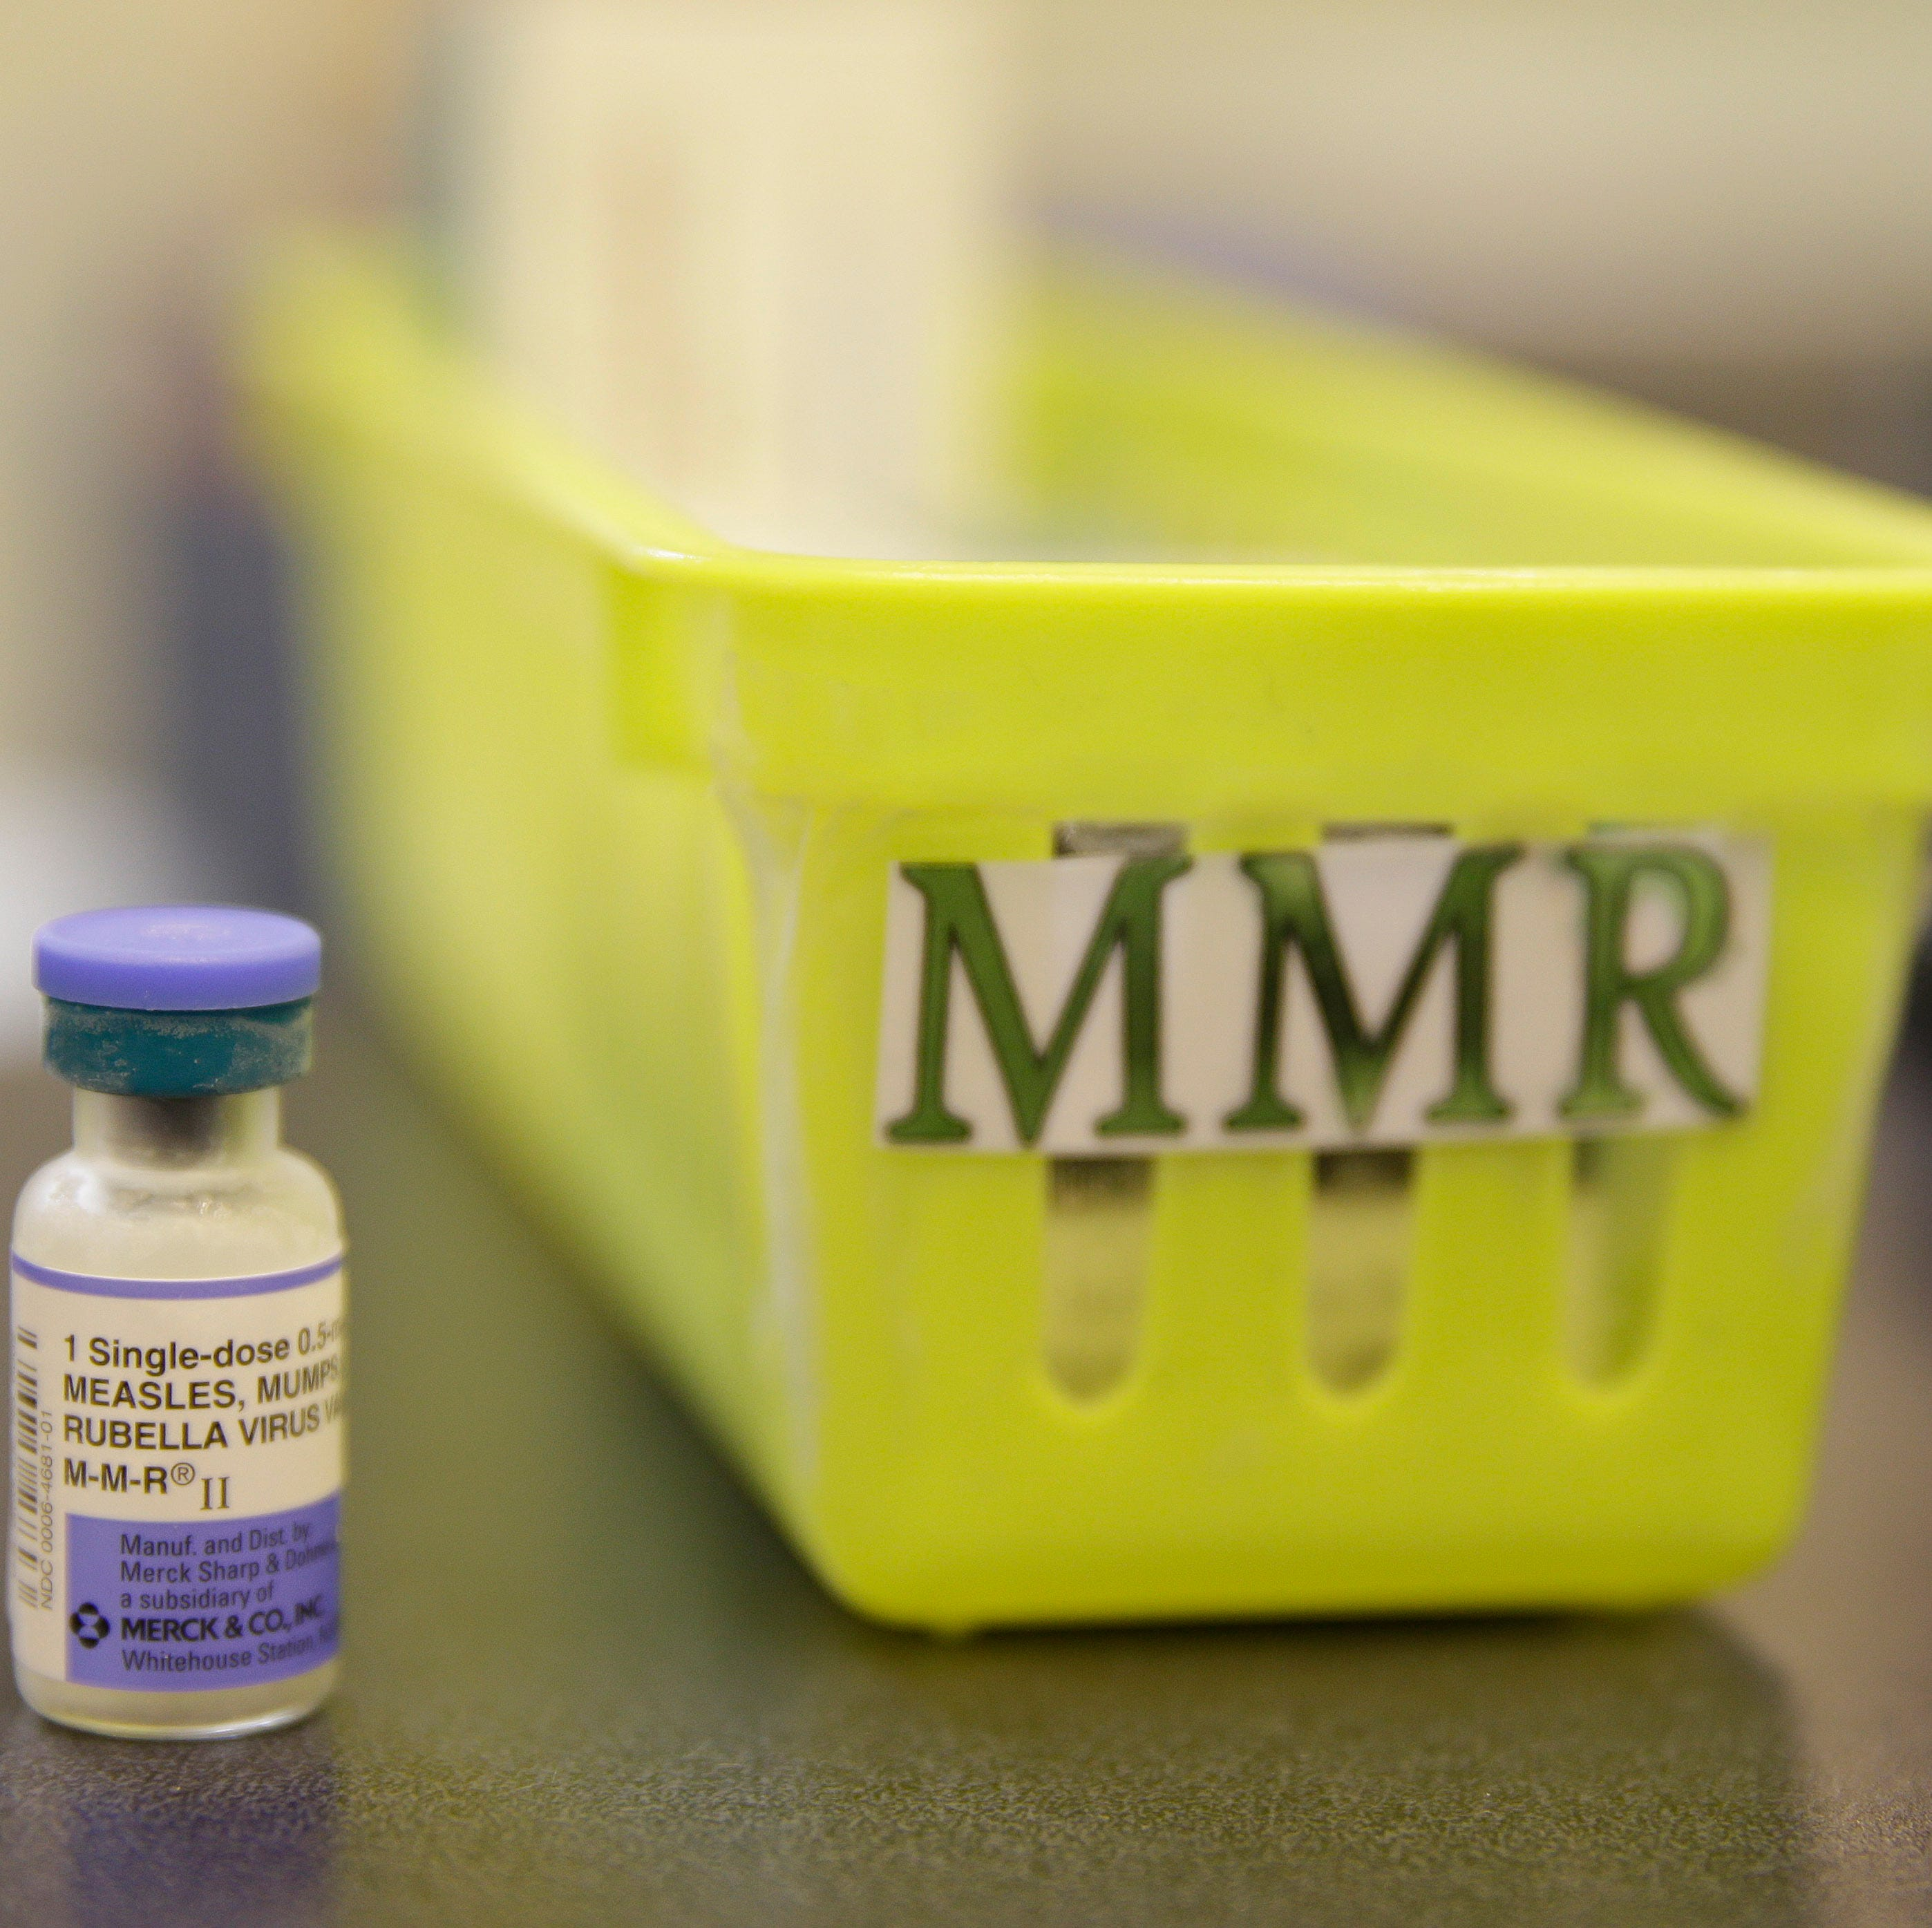 Measles update: officials monitor Salem case, await test results